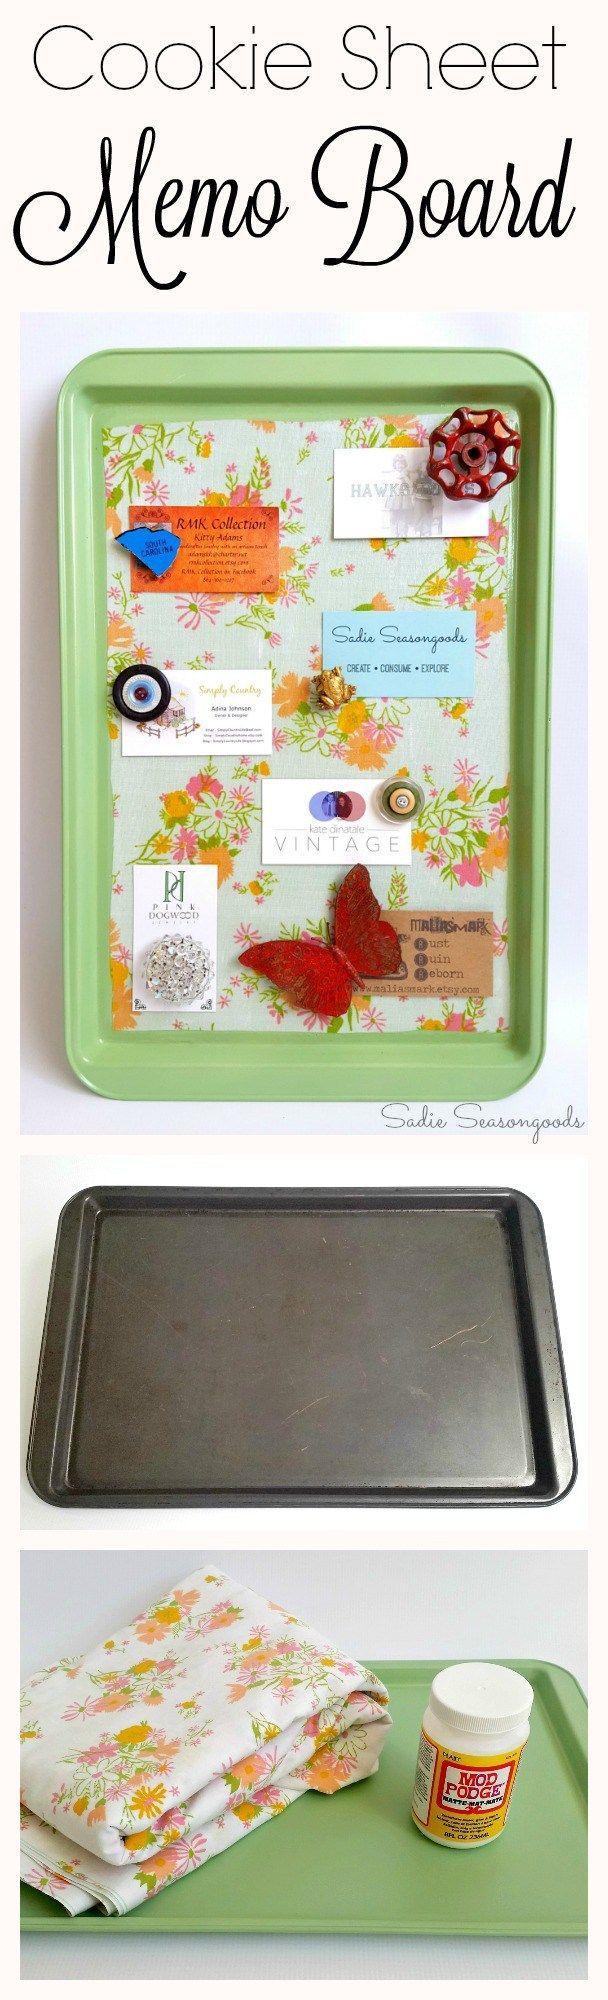 DIY repurposed cookie sheet magnetic memo board with mod podge vintage bed sheet fabric by Sadie Seasongoods / http://www.sadieseasongoods.com   #InspirationSpotlight